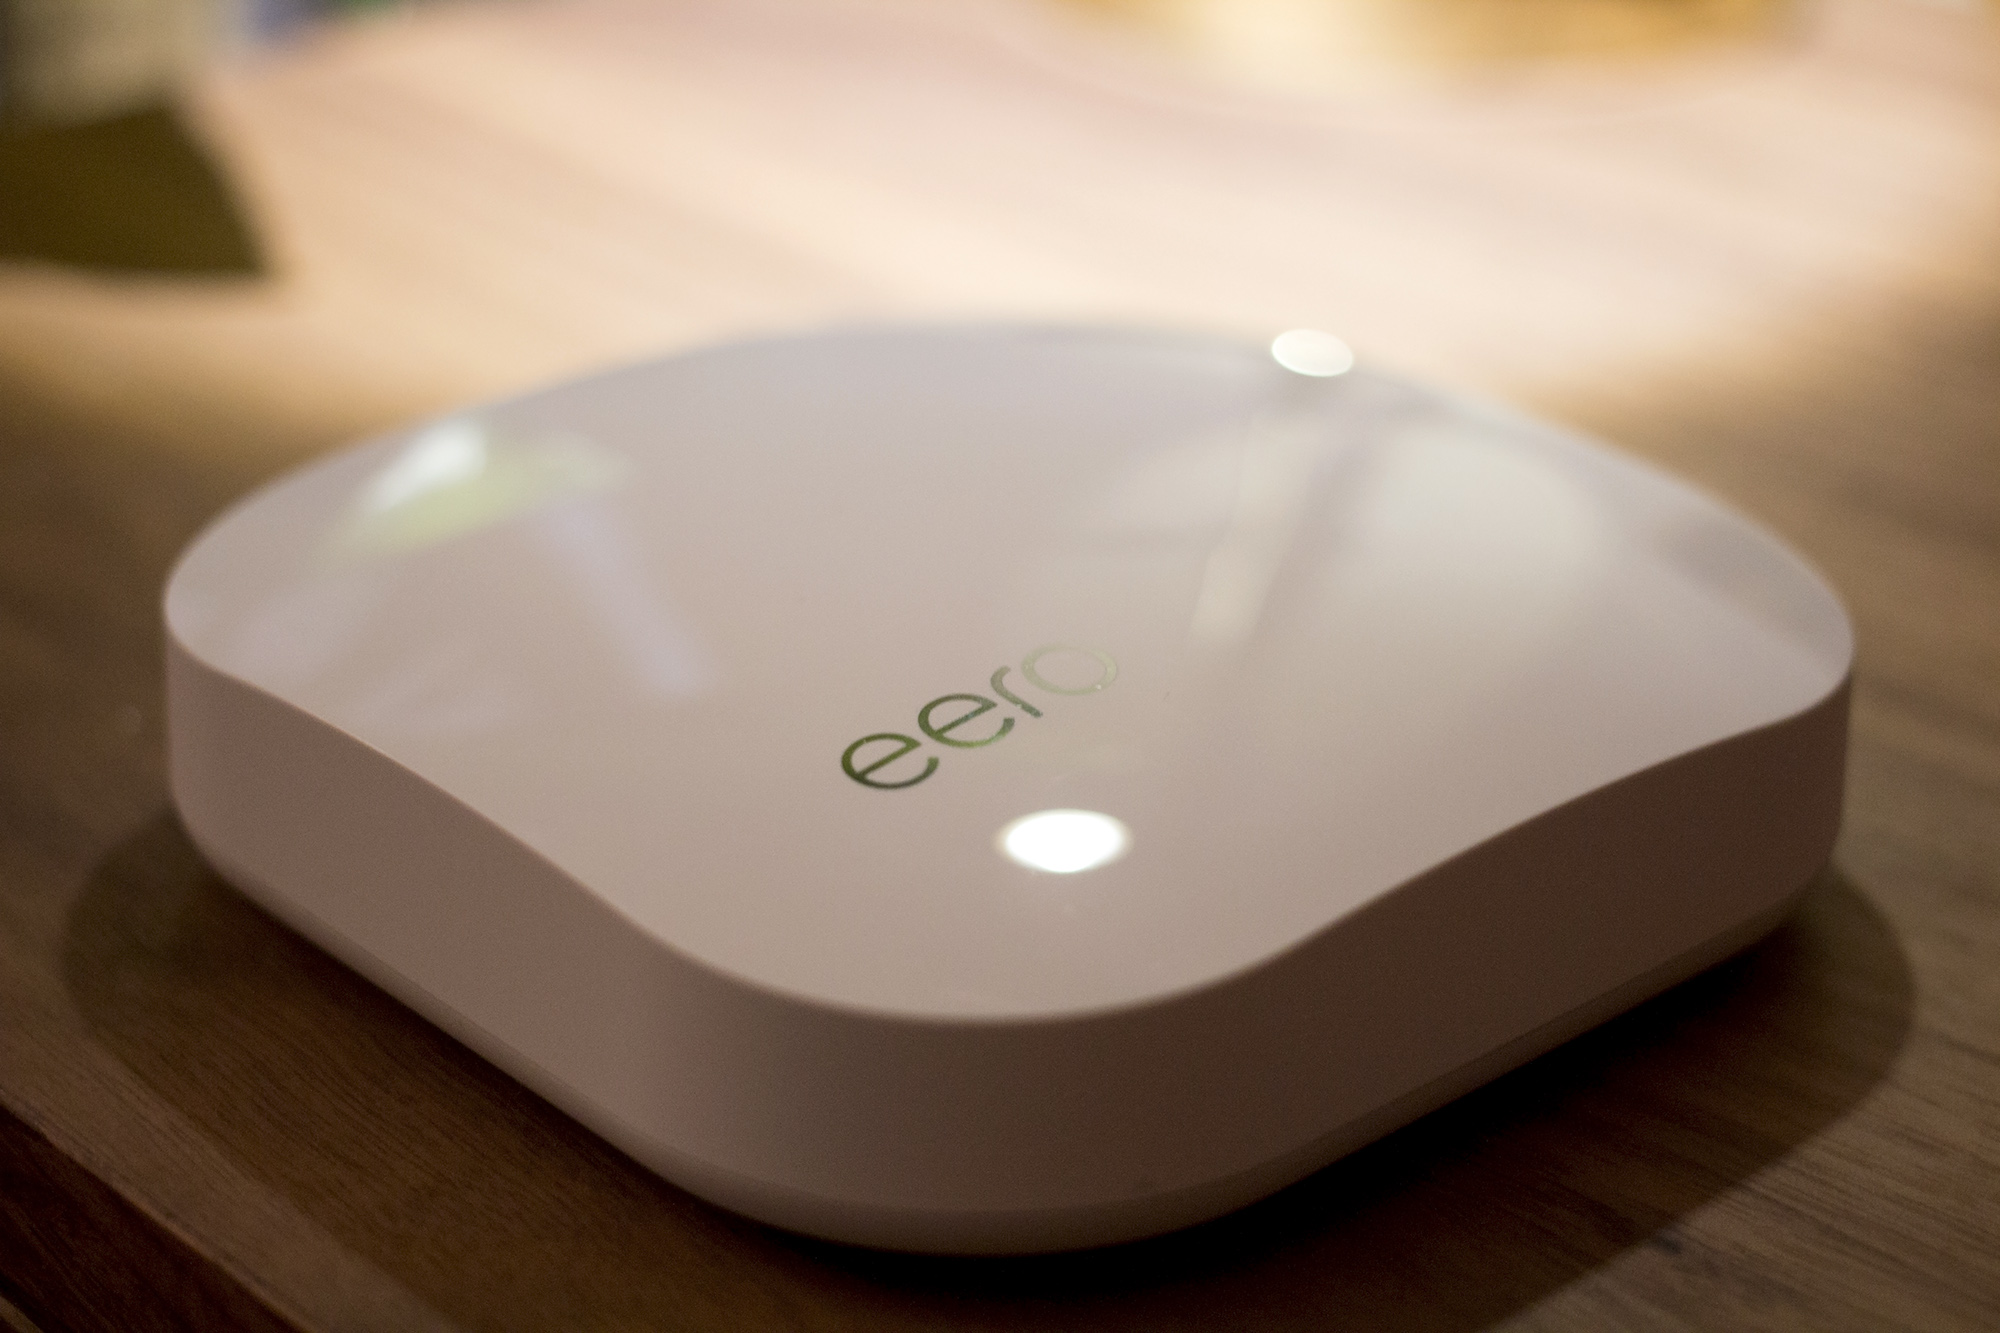 eero router 2